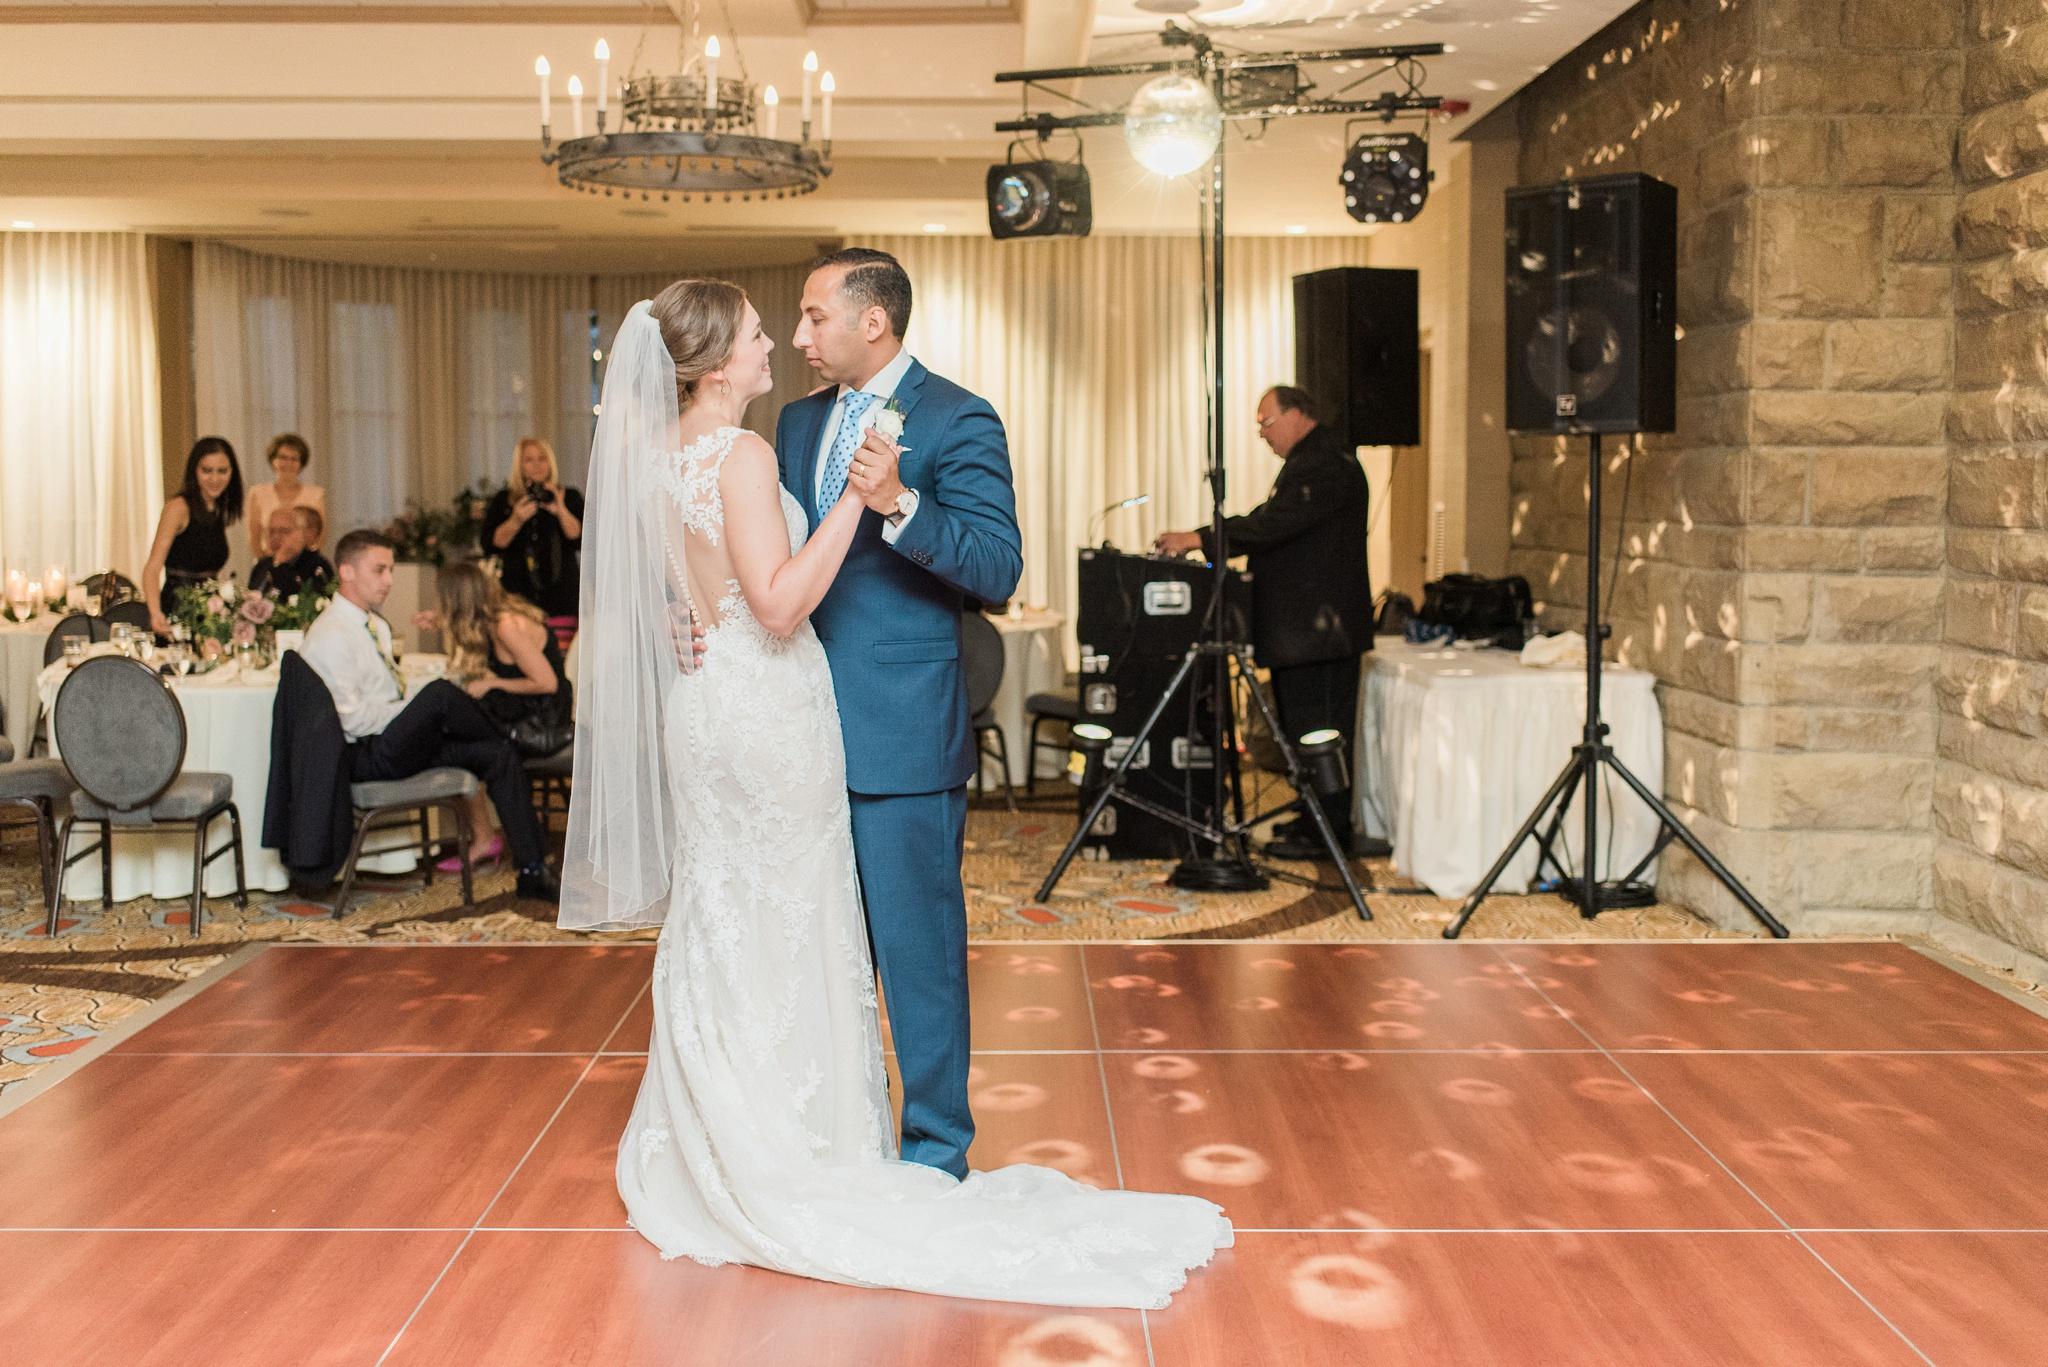 granville-inn-wedding-columbus-ohio-photographer_0107.jpg